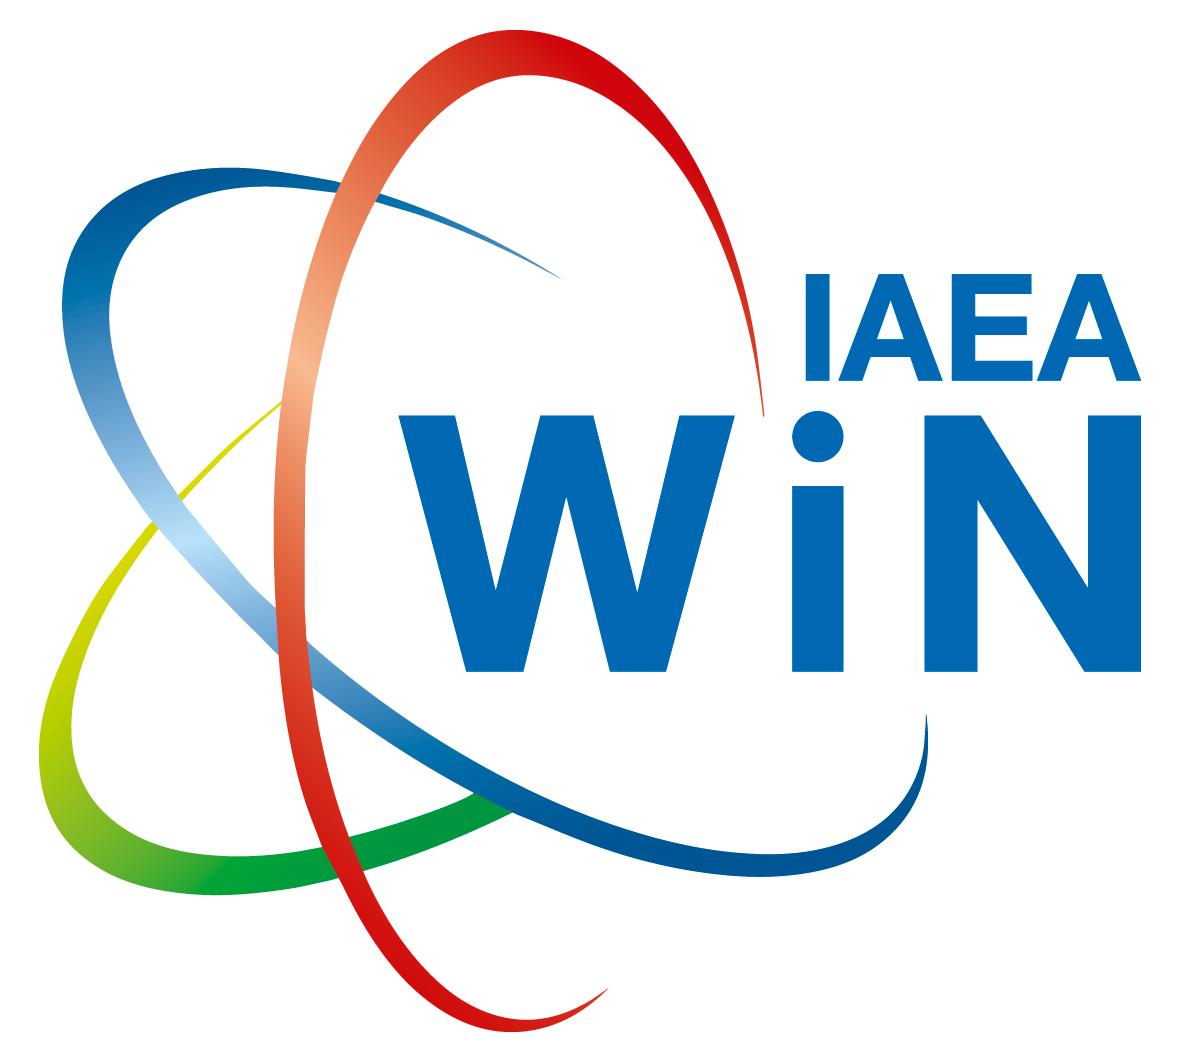 WiN IAEA logo